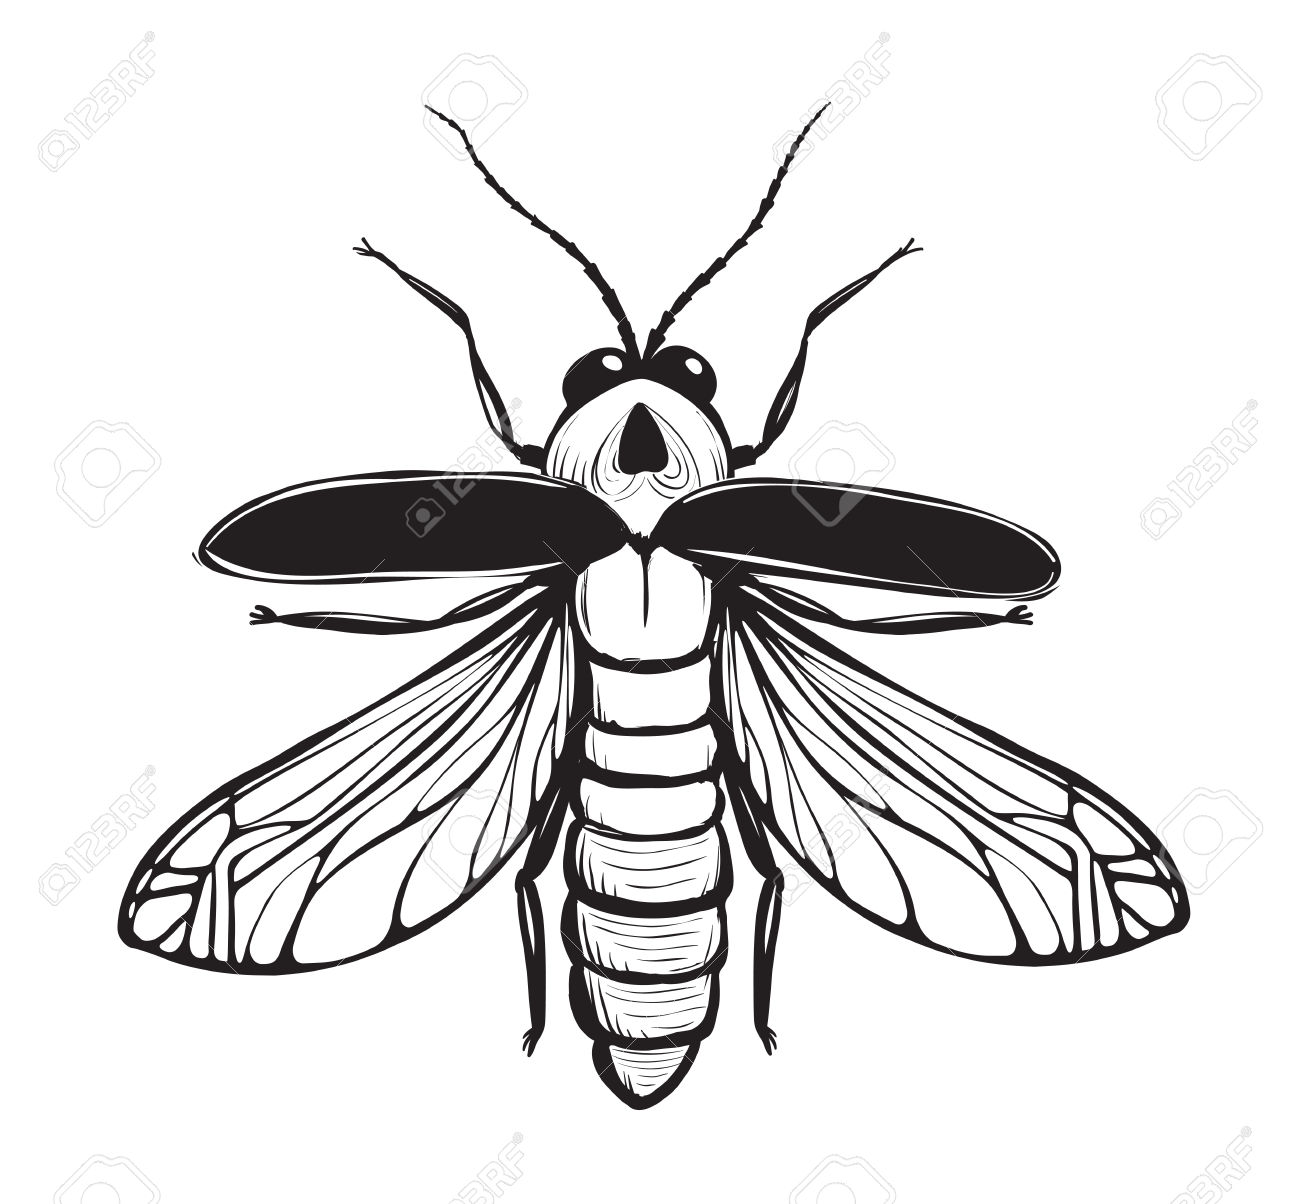 1300x1204 29081734 Firefly Insect Black Inky Drawing Bug Glowworm